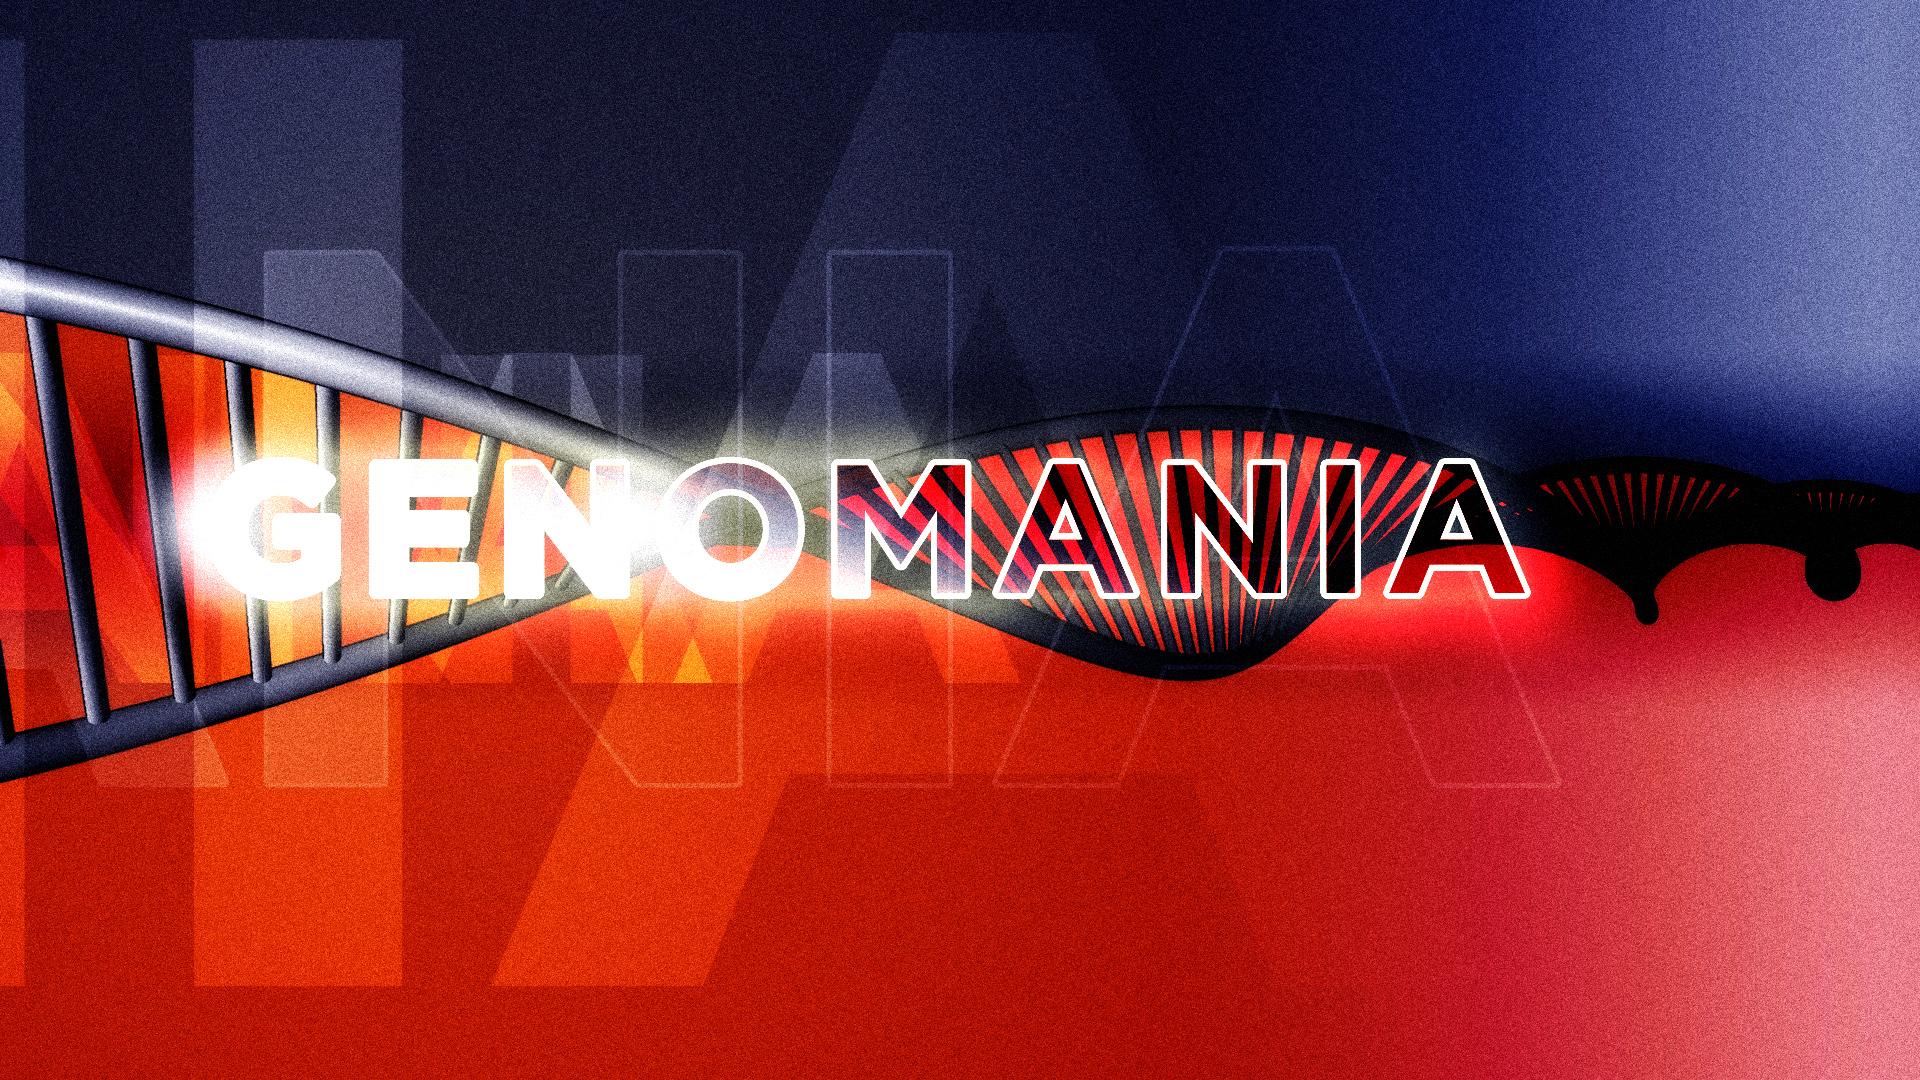 Genomania_02_01.jpg